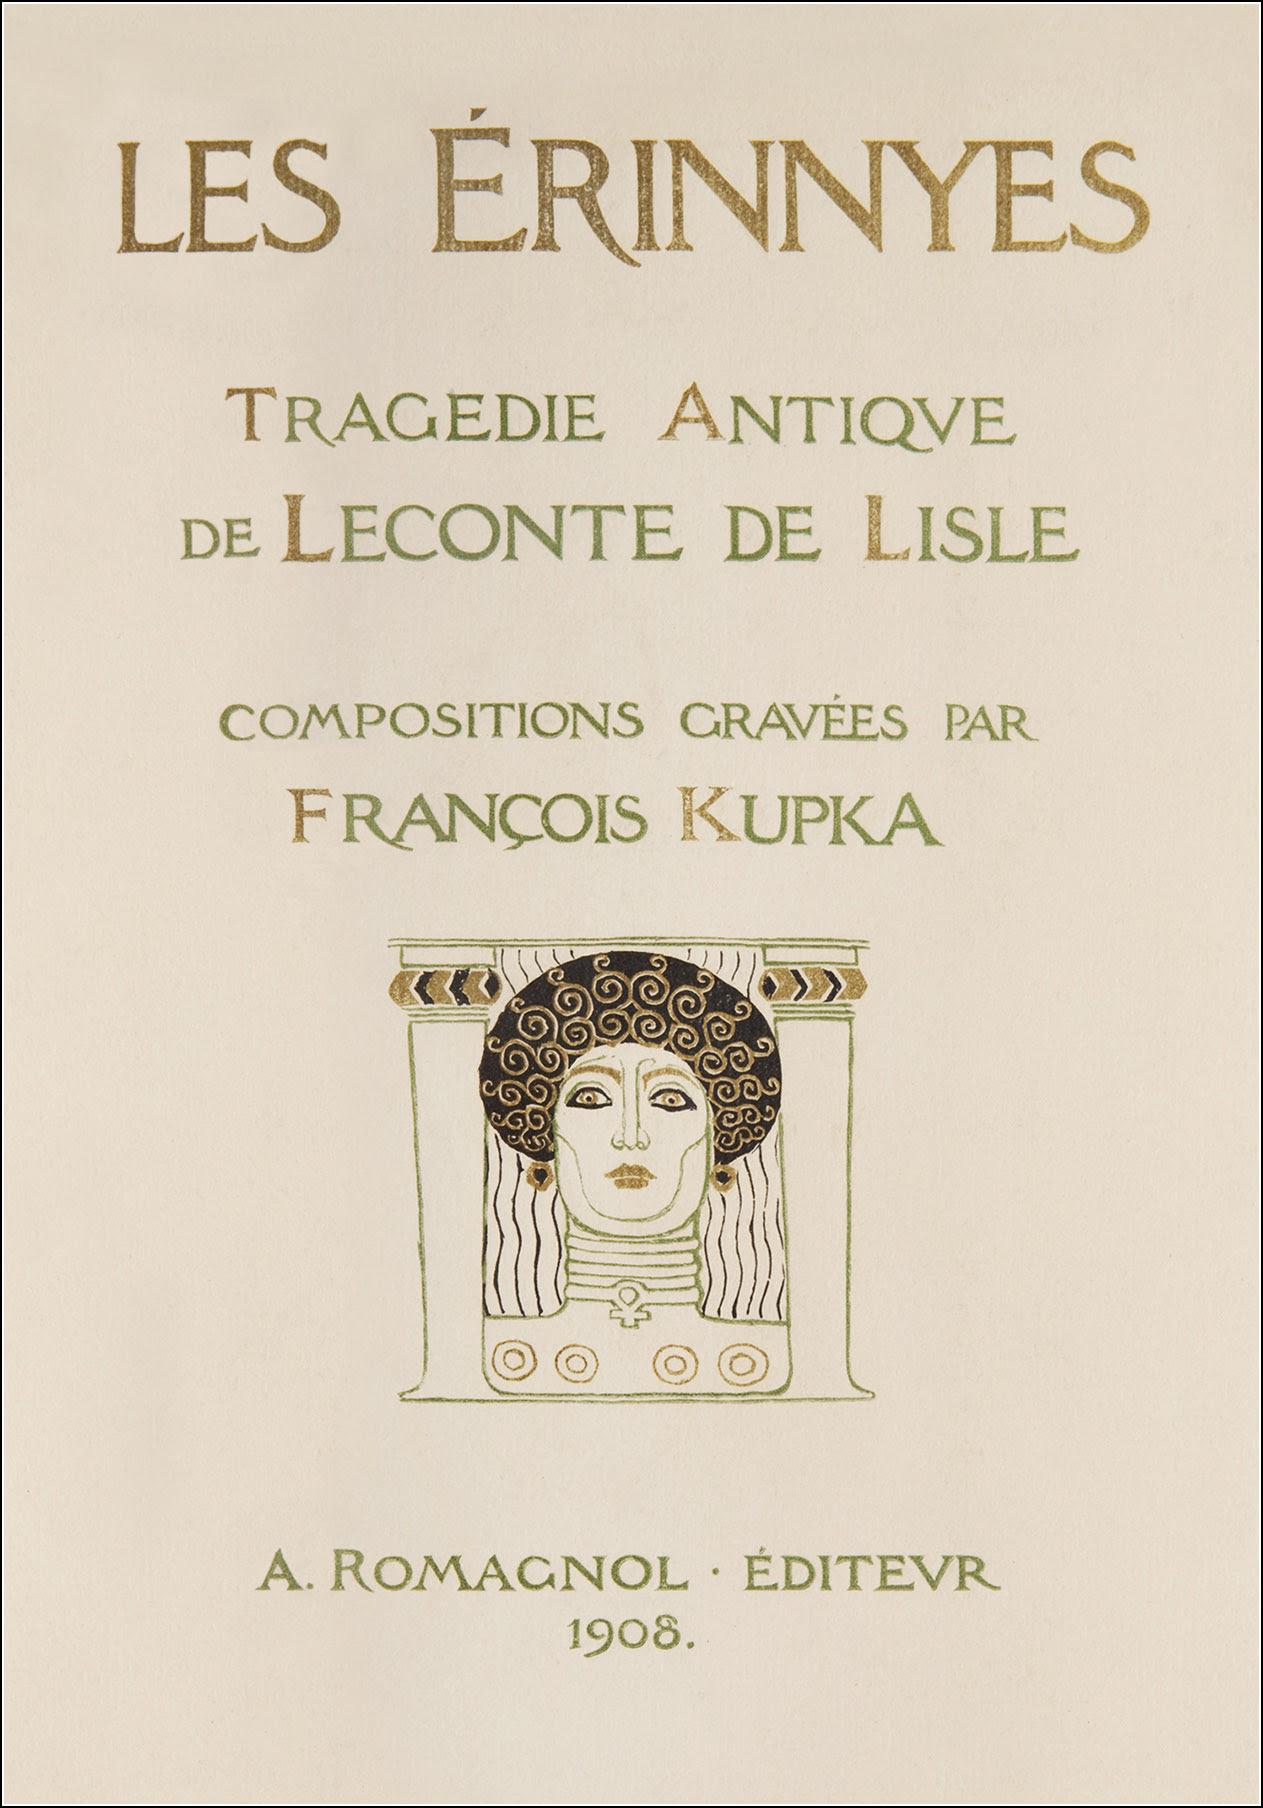 František Kupka, Leconte de Lisle, Les Erinnyes